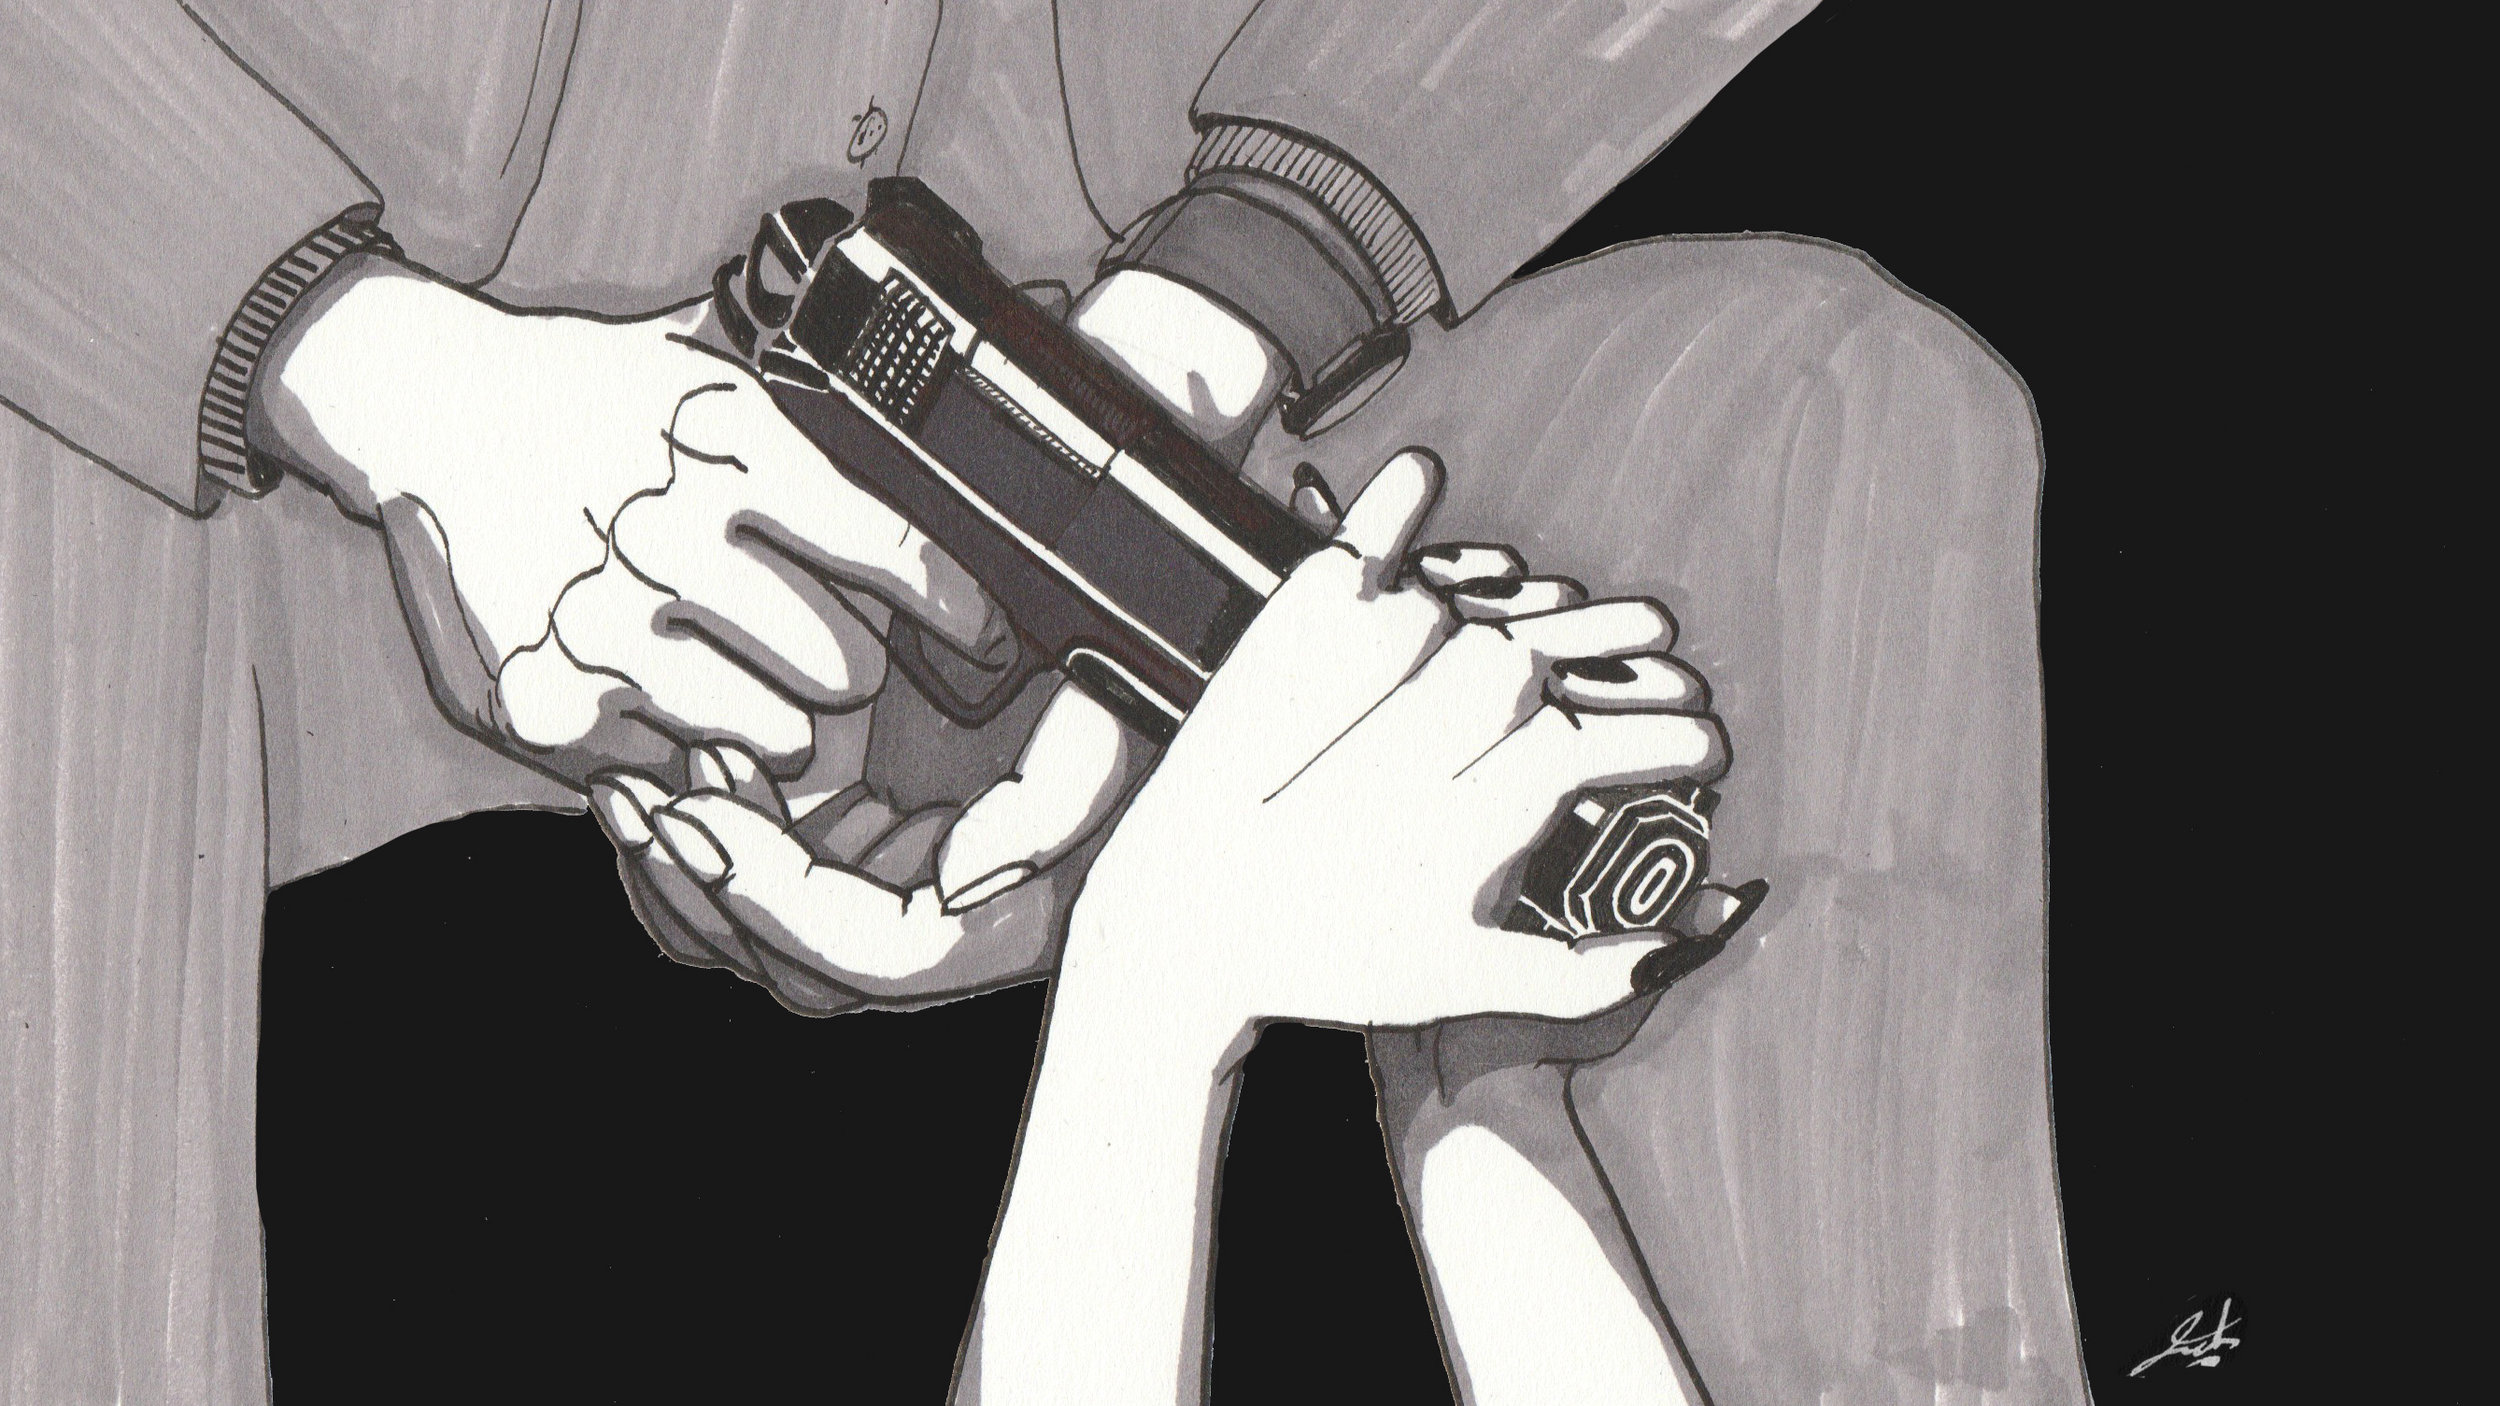 Buddy Cop A Love Story Wet Men Phallic Symbols And Fragile